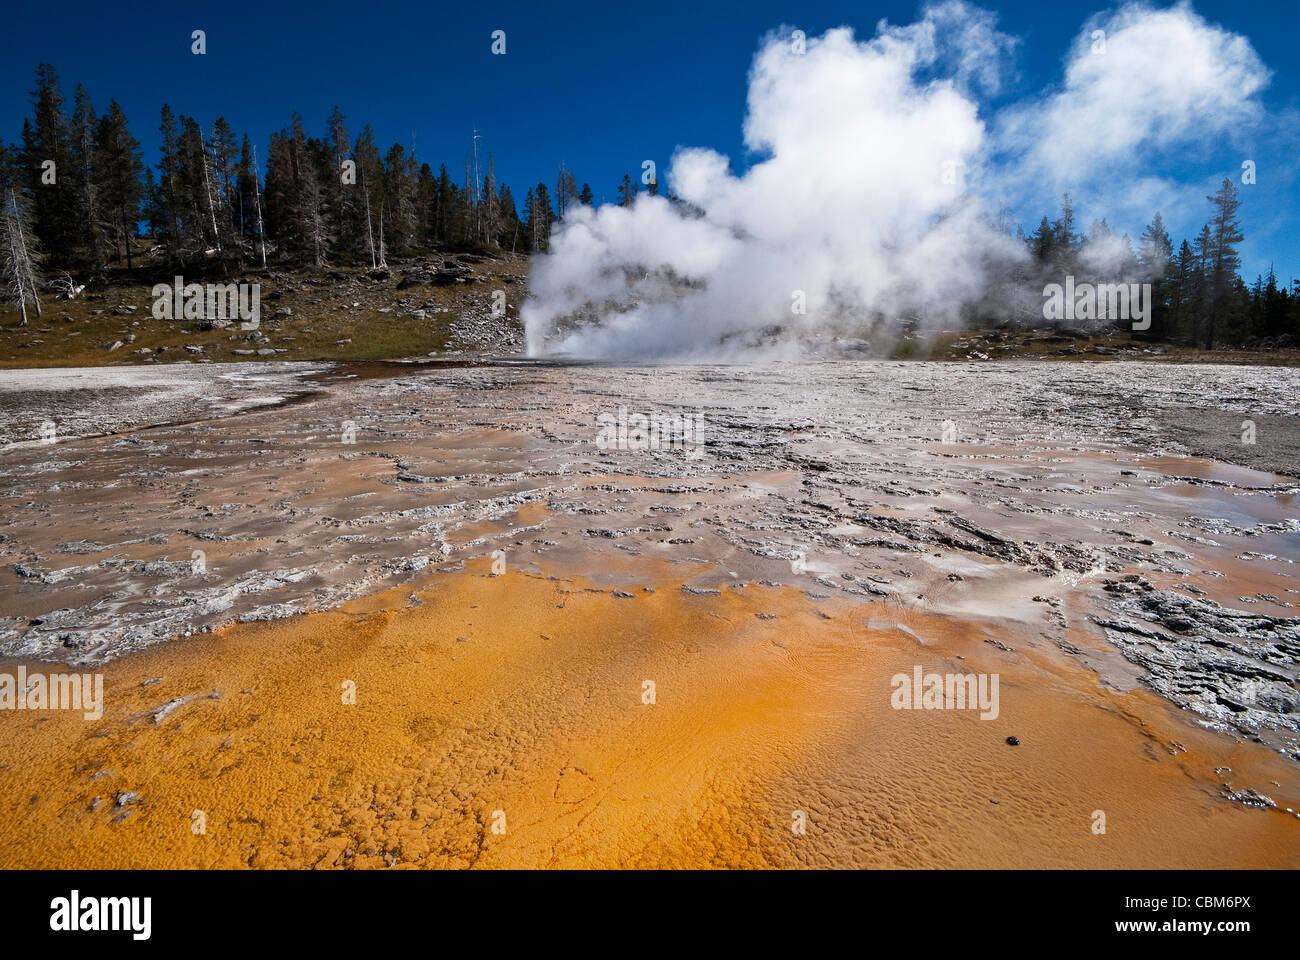 Grand/Turban Geysers Yellowstone National Park Wyoming USA - Stock Image